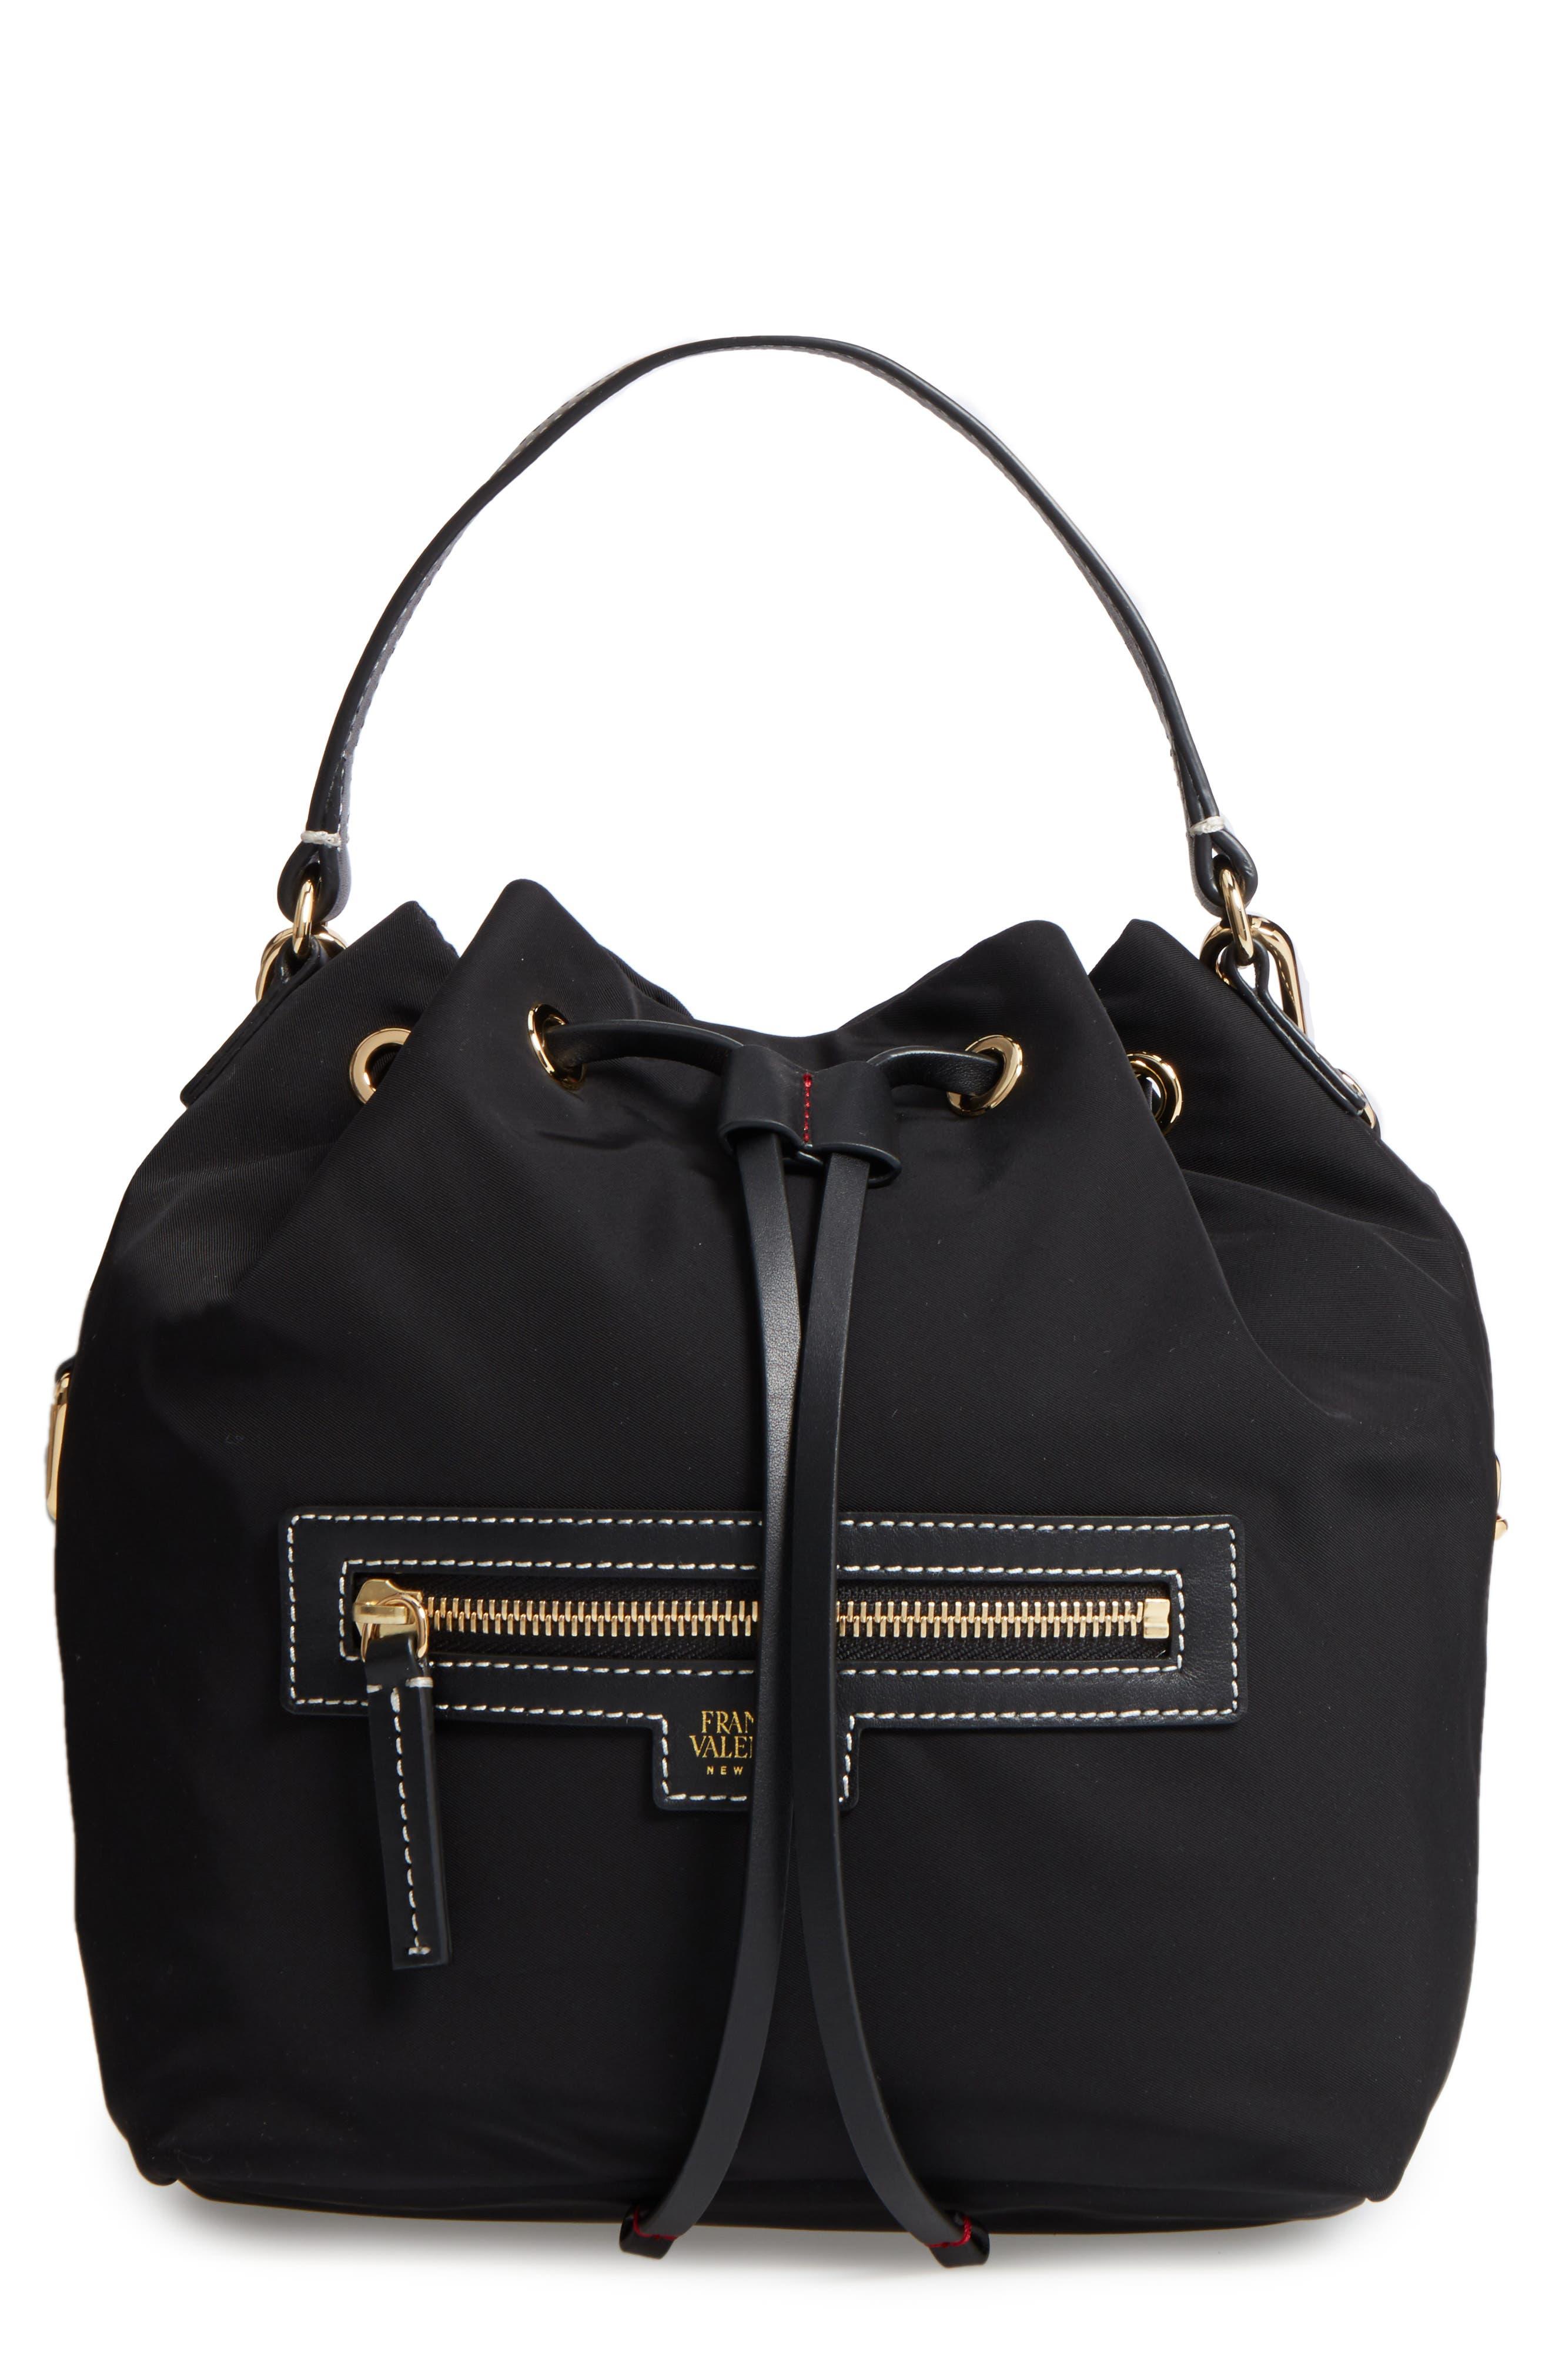 Medium Ann Nylon Bucket Bag,                             Main thumbnail 1, color,                             001